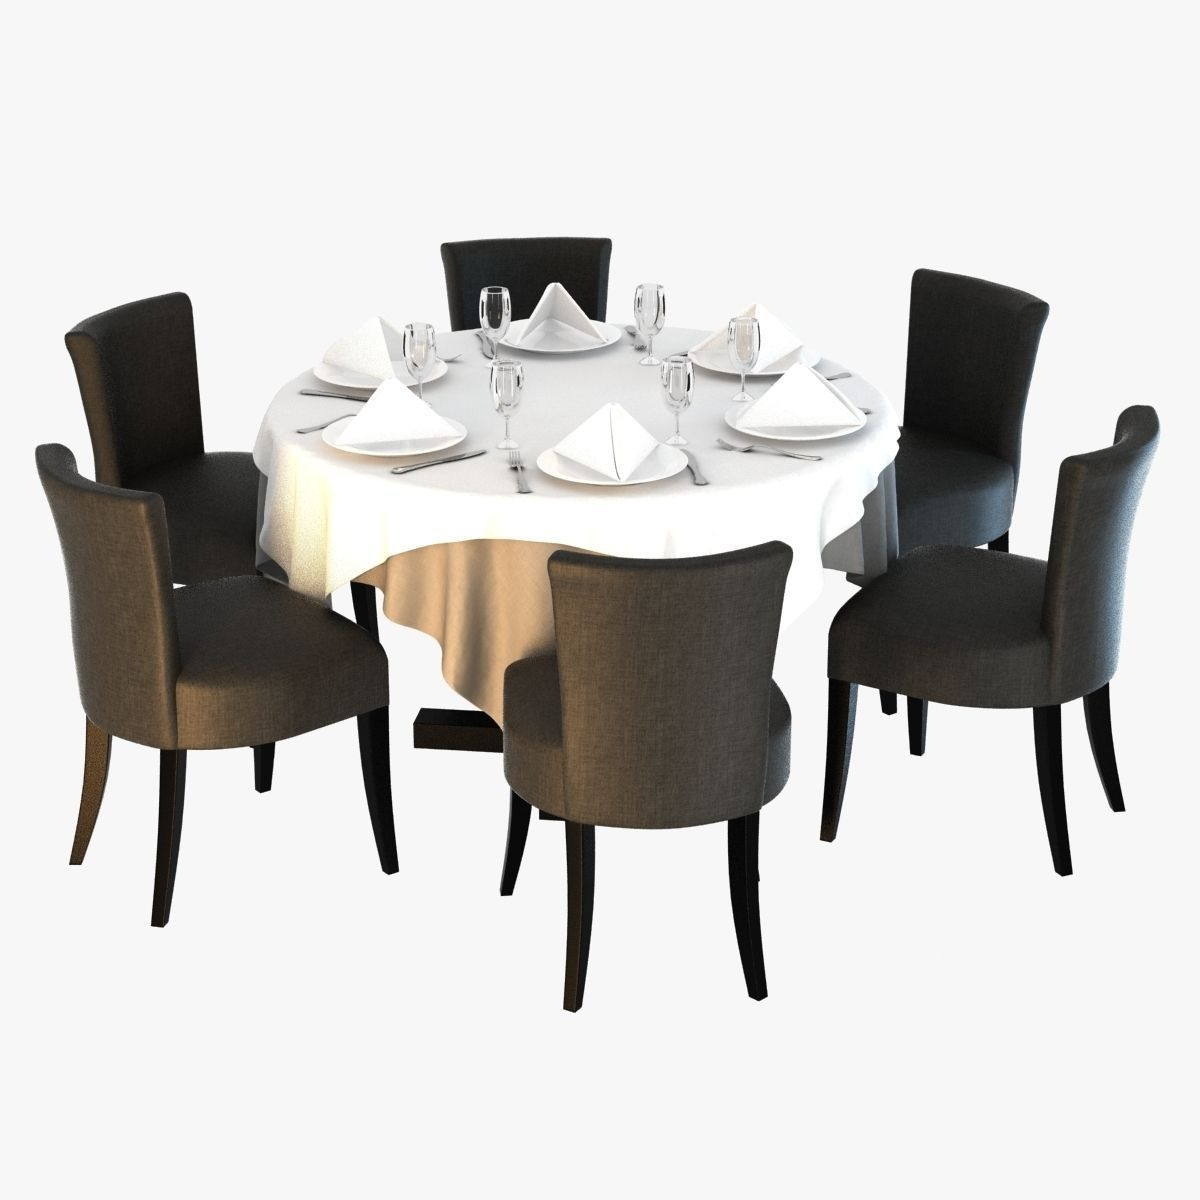 atlantic dining chair 3d model max obj 3ds fbx